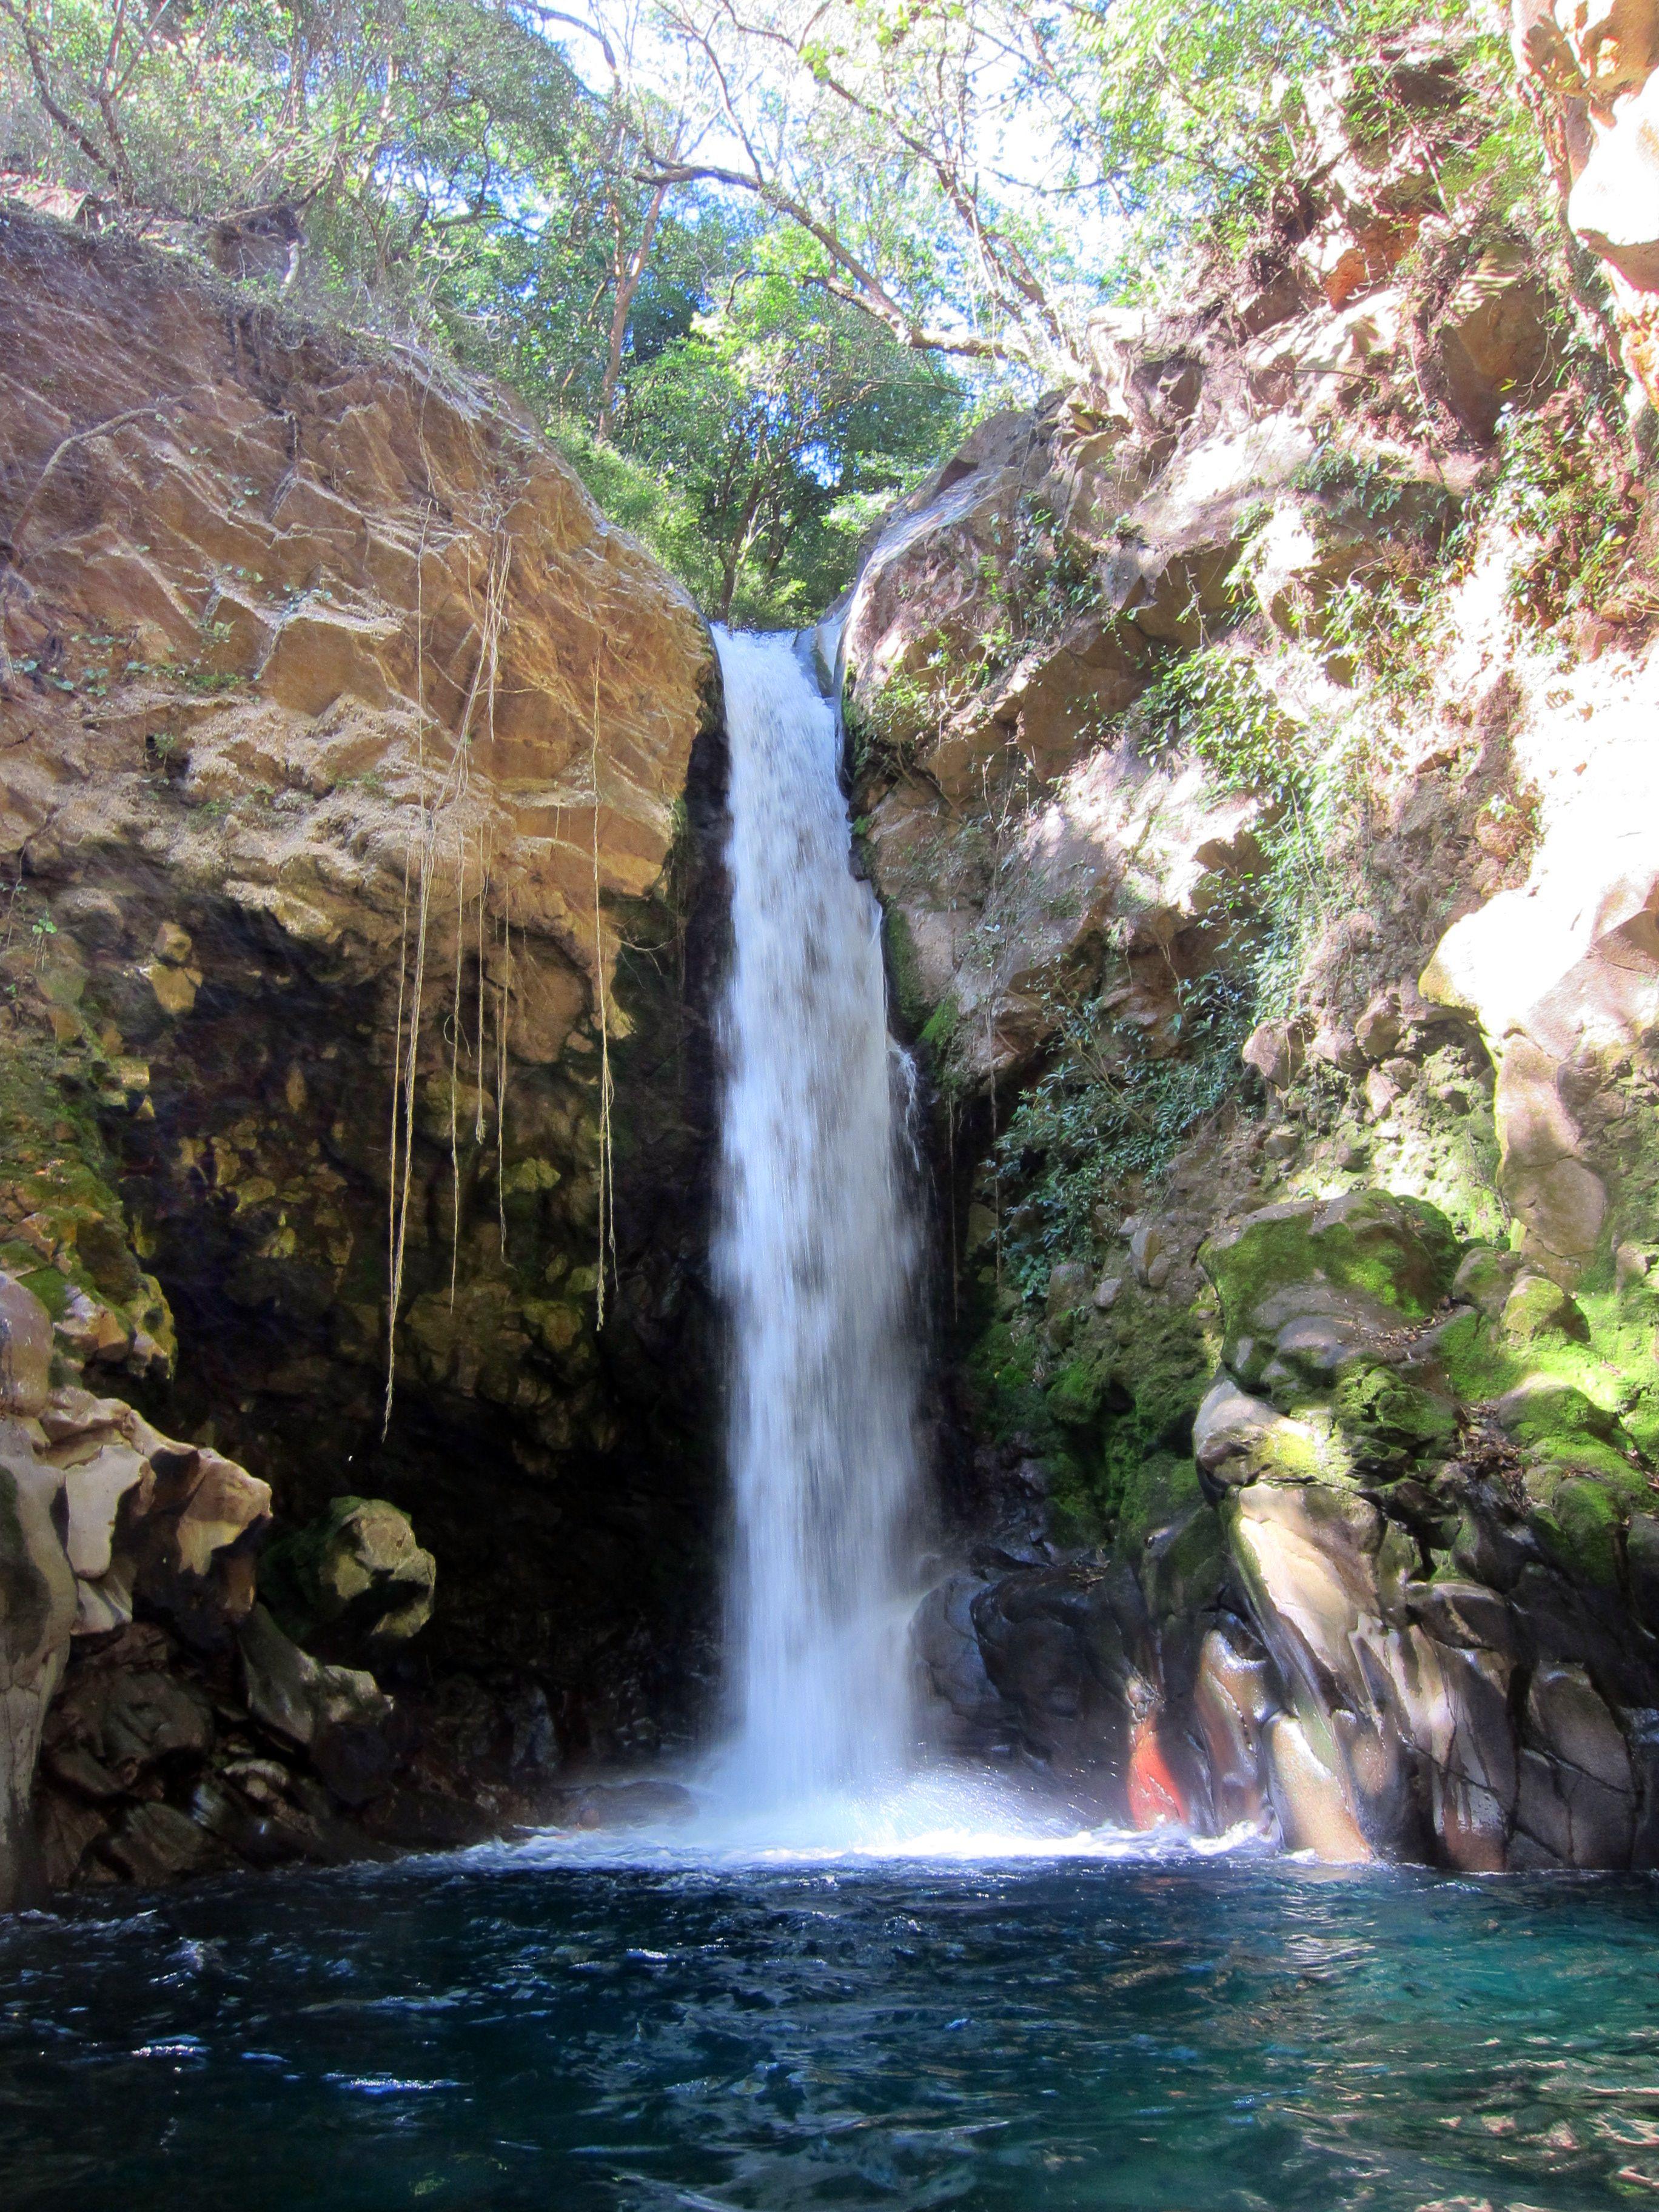 Oropendola Waterfall Costa Rica Swimming Here Was So